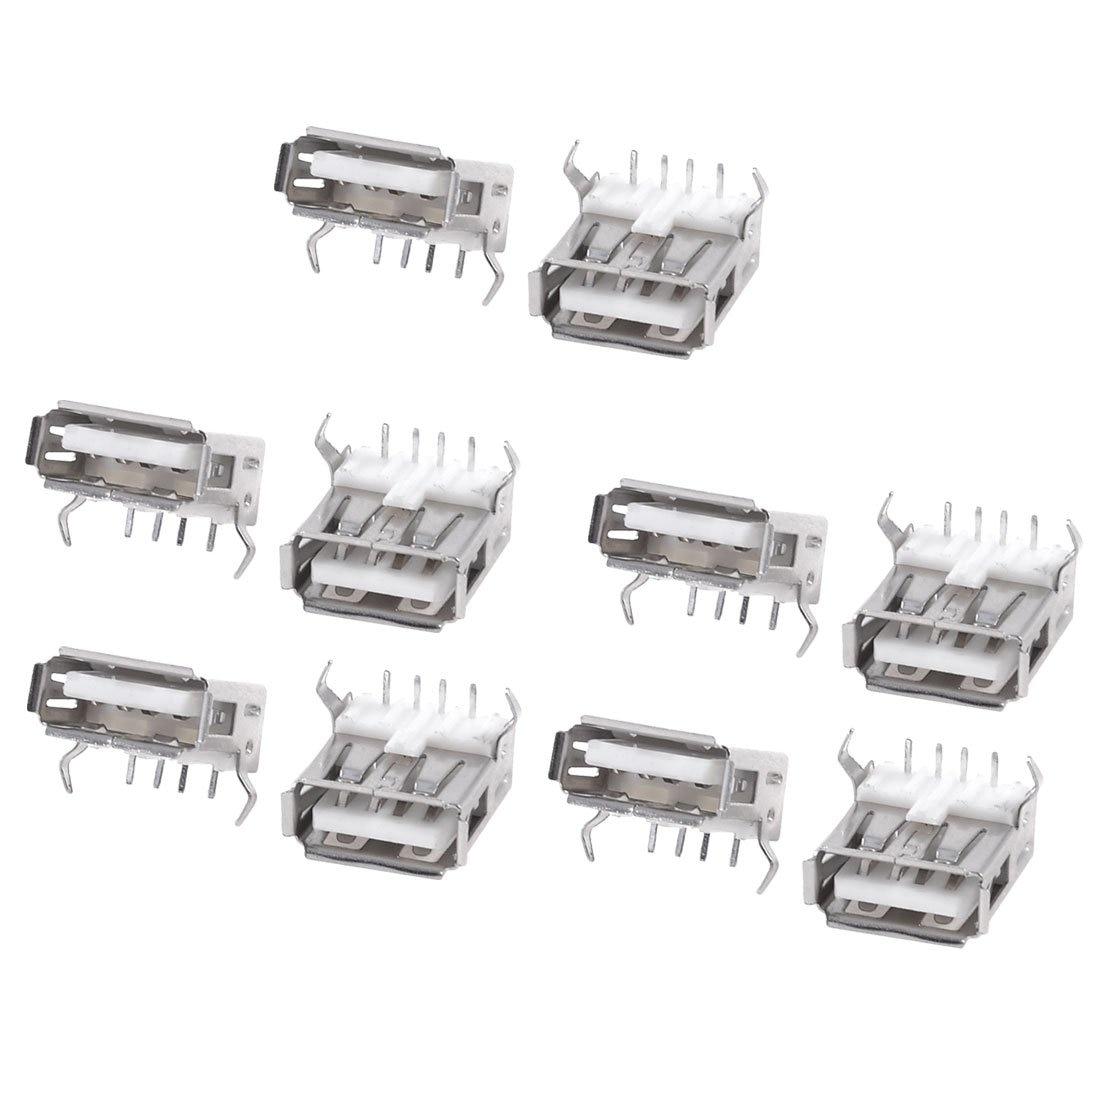 WSFS Hot Sale 10PCS USB Type A Standard Port Female Solder